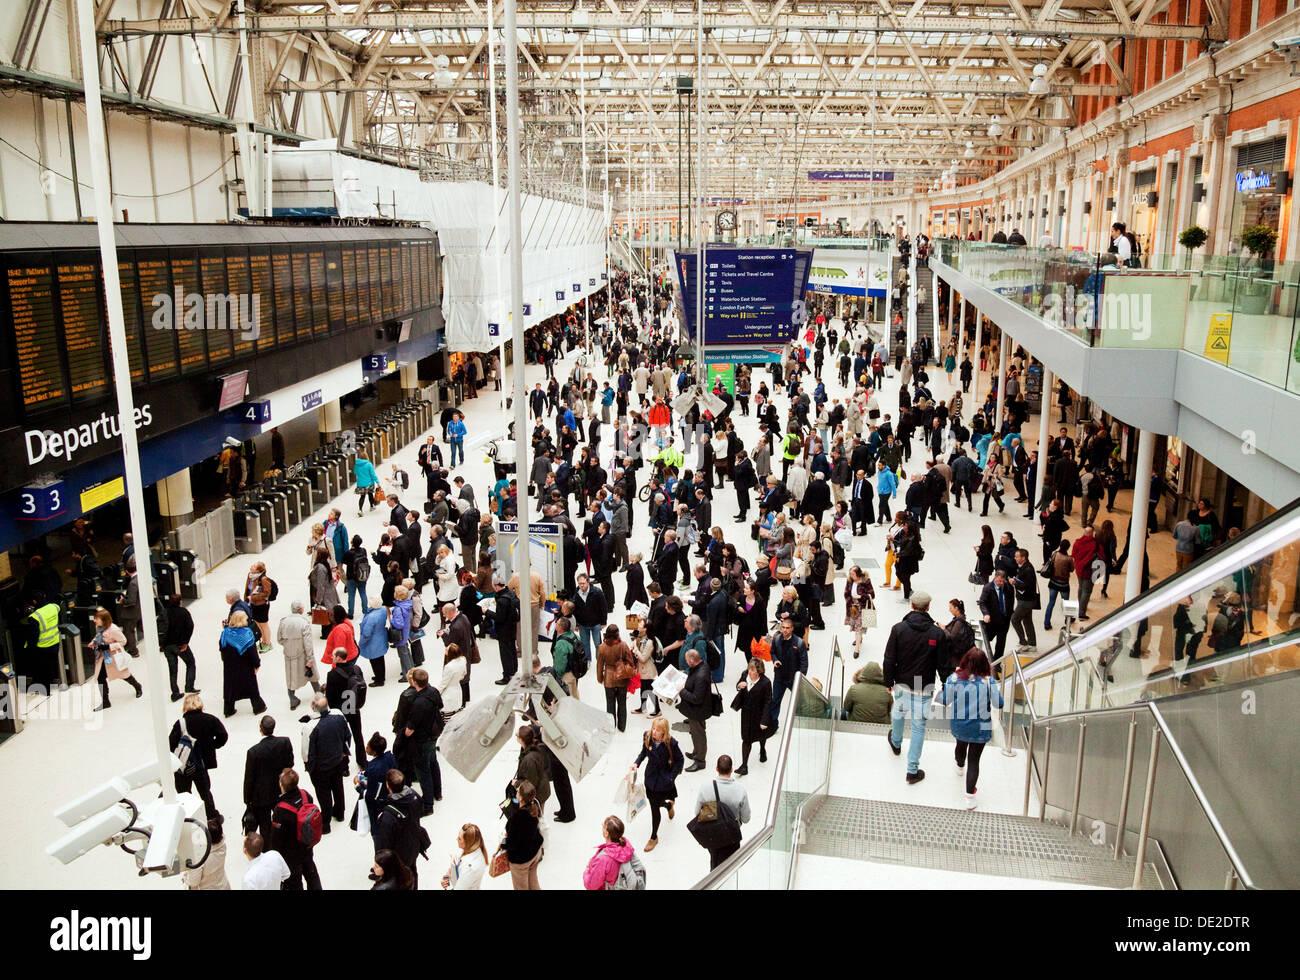 Waterloo Bahnhofshalle im Feierabendverkehr, London England UK Stockbild